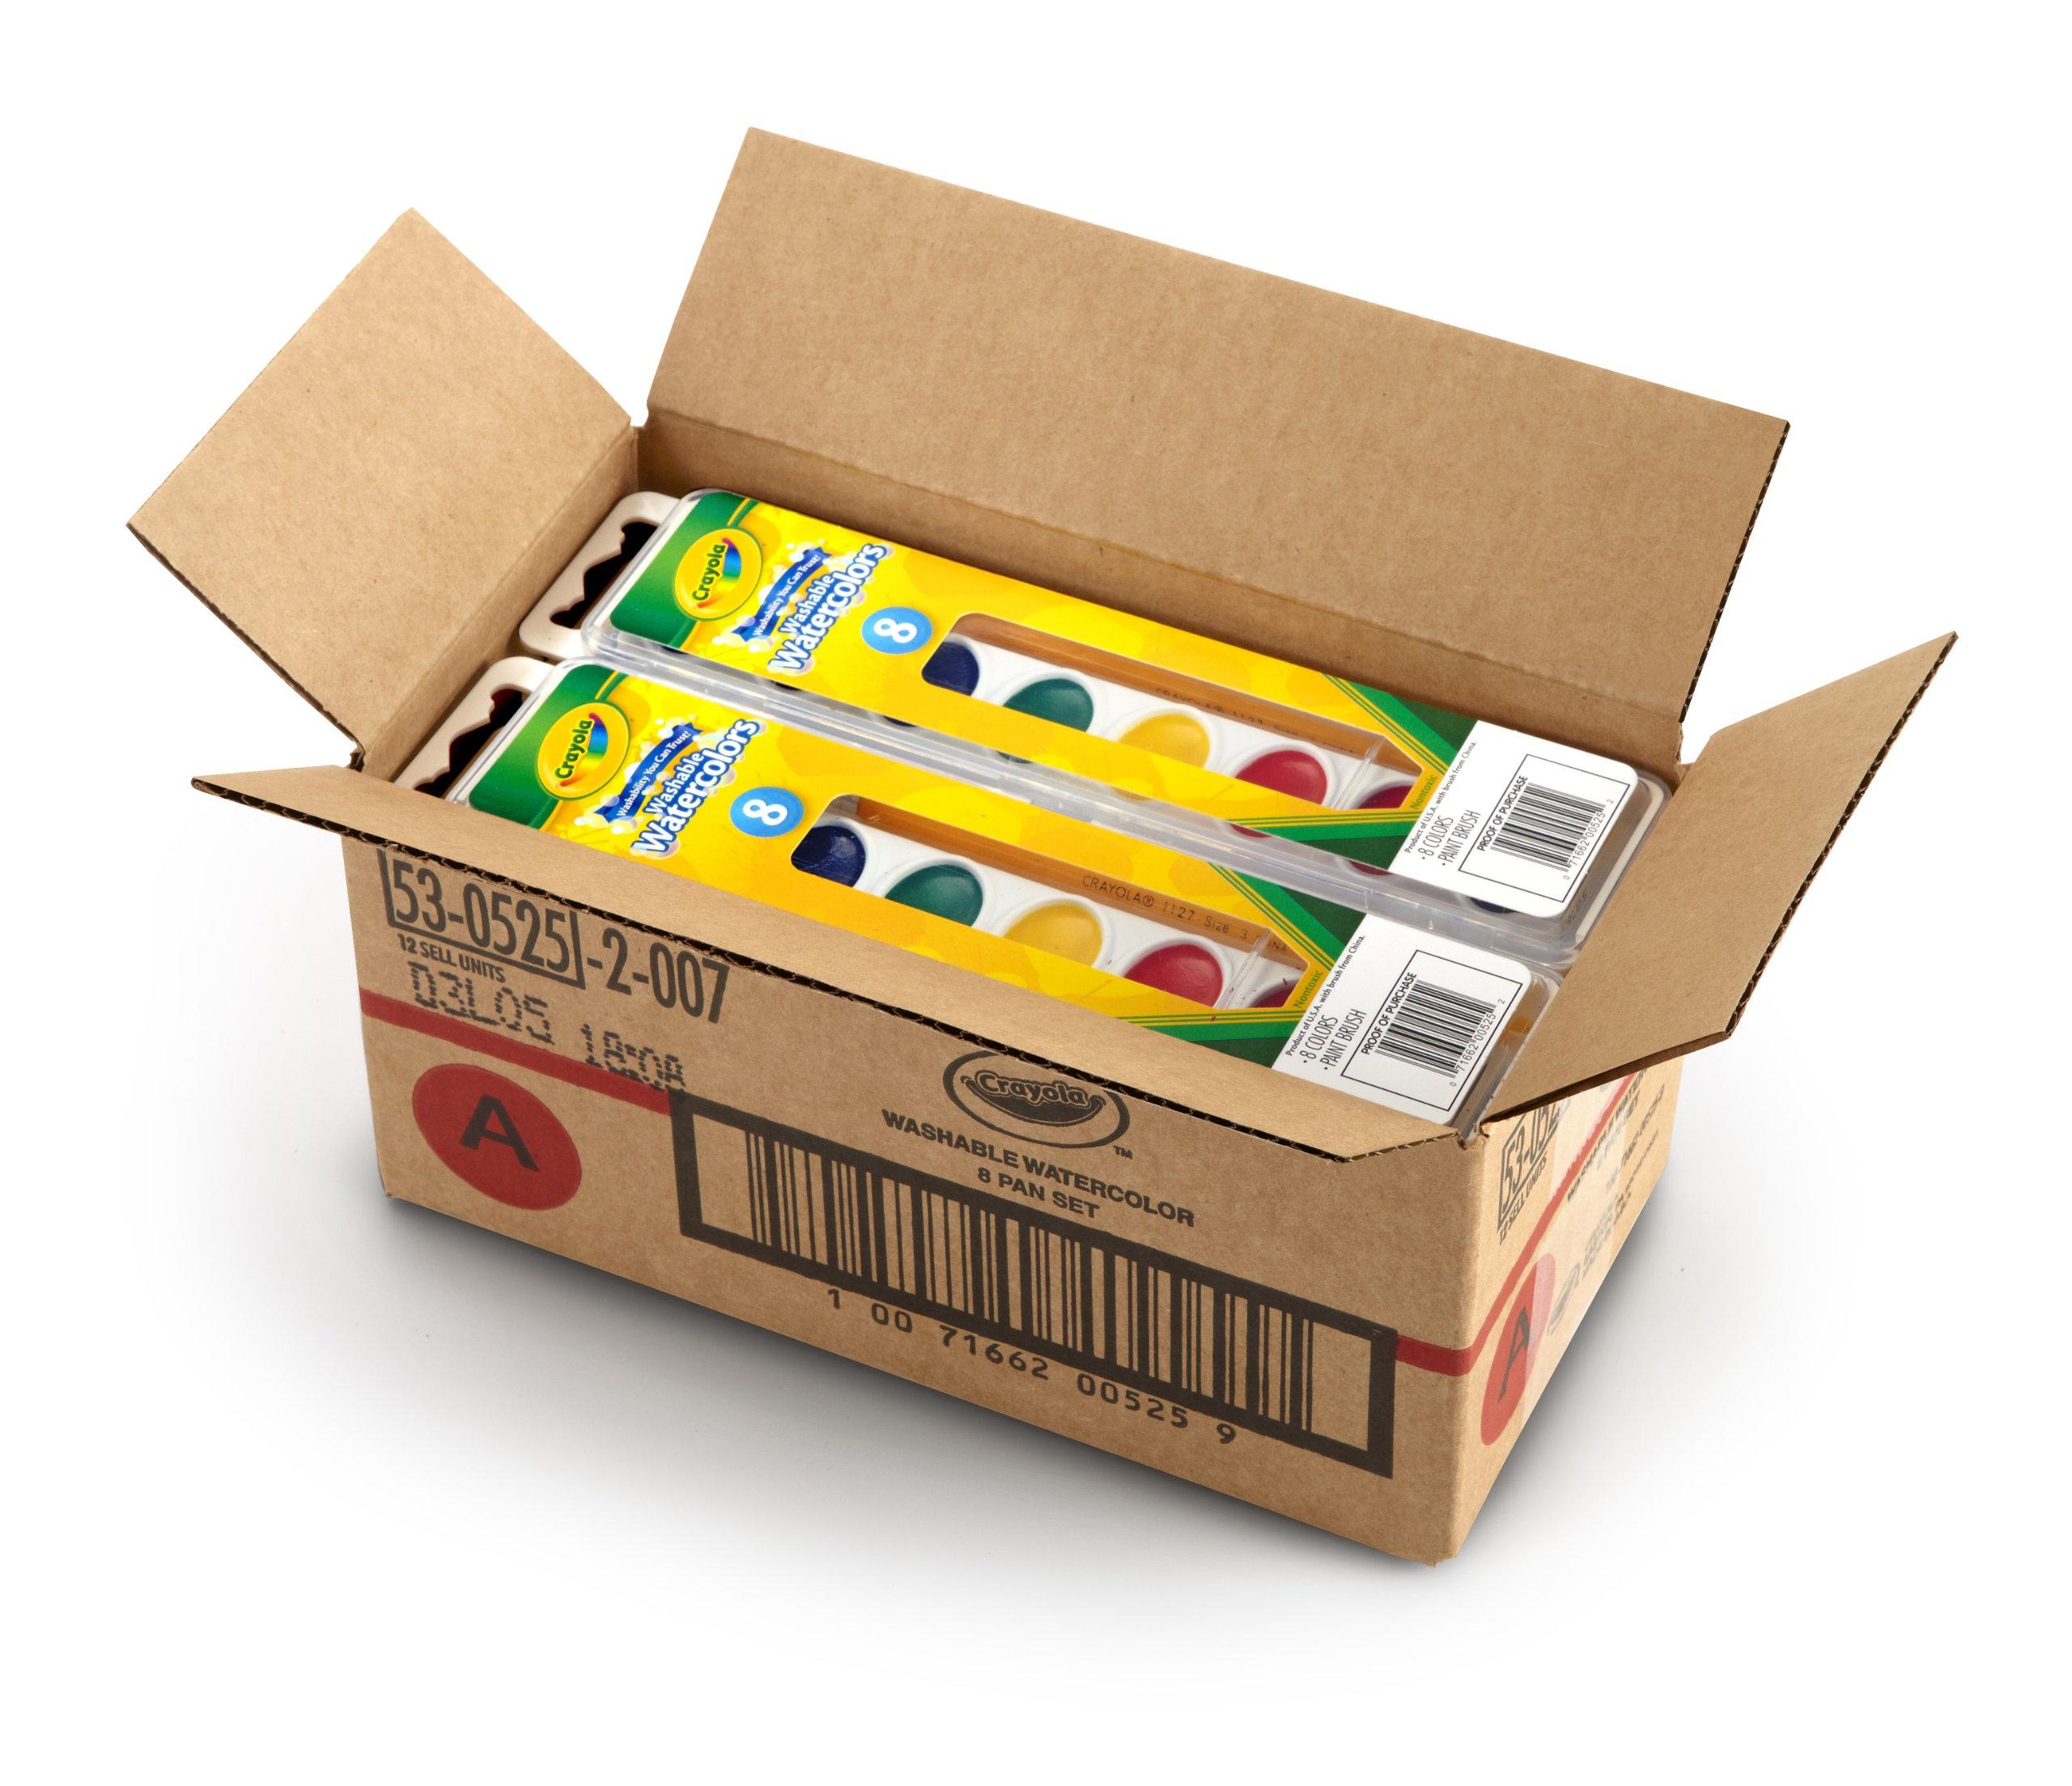 Crayola 53-0525-1 8 Pan Set Washable Watercolors, 12 Pack by Crayola (Image #2)